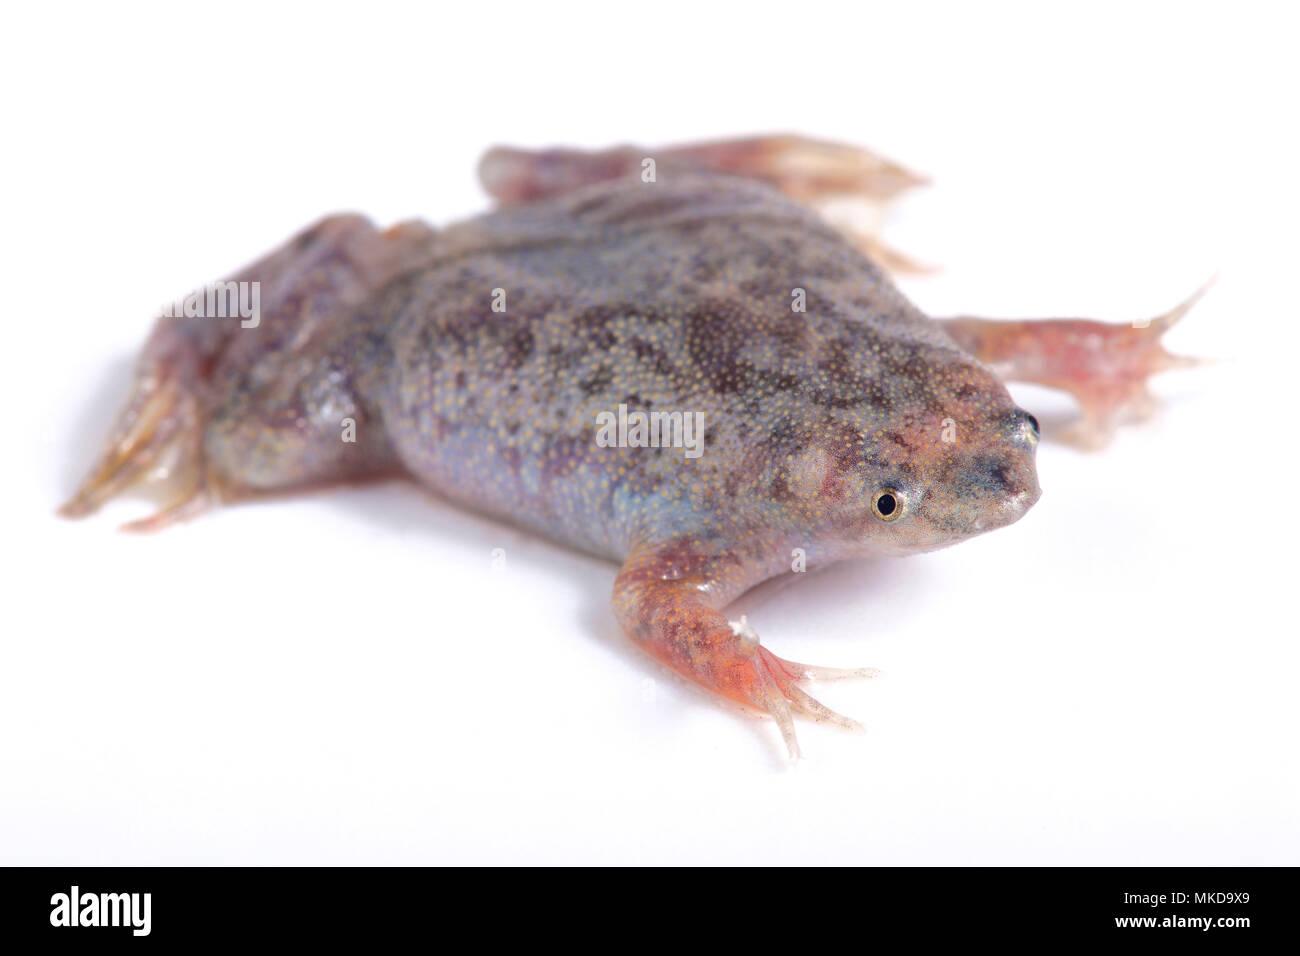 Sabana Surinam toad (Pipa parva) on white background - Stock Image